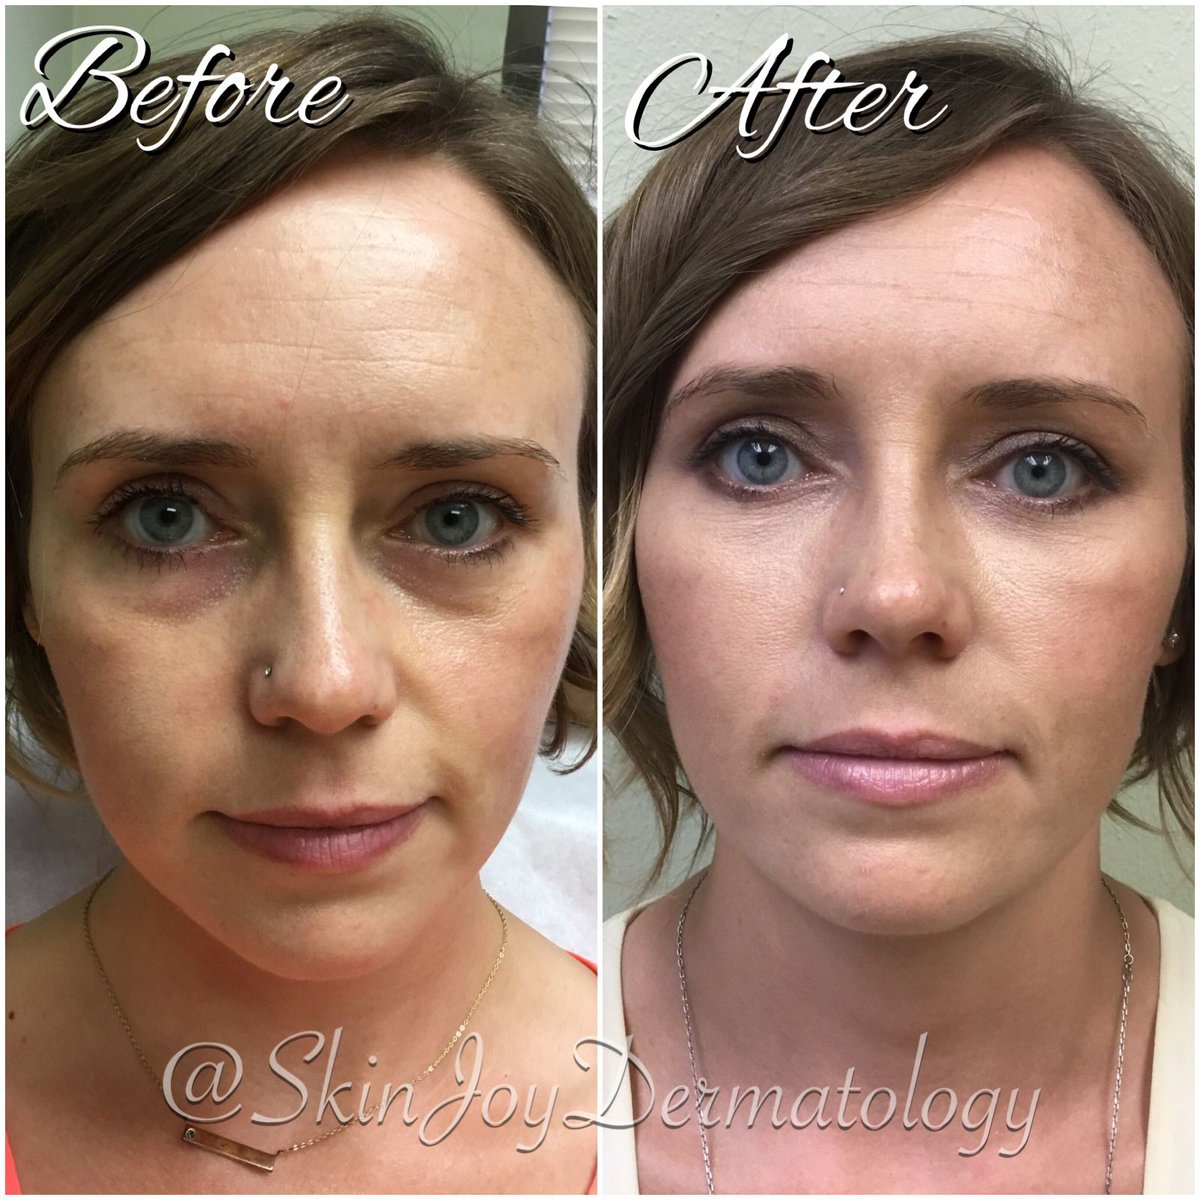 Skin Joy Dermatology on Twitter: